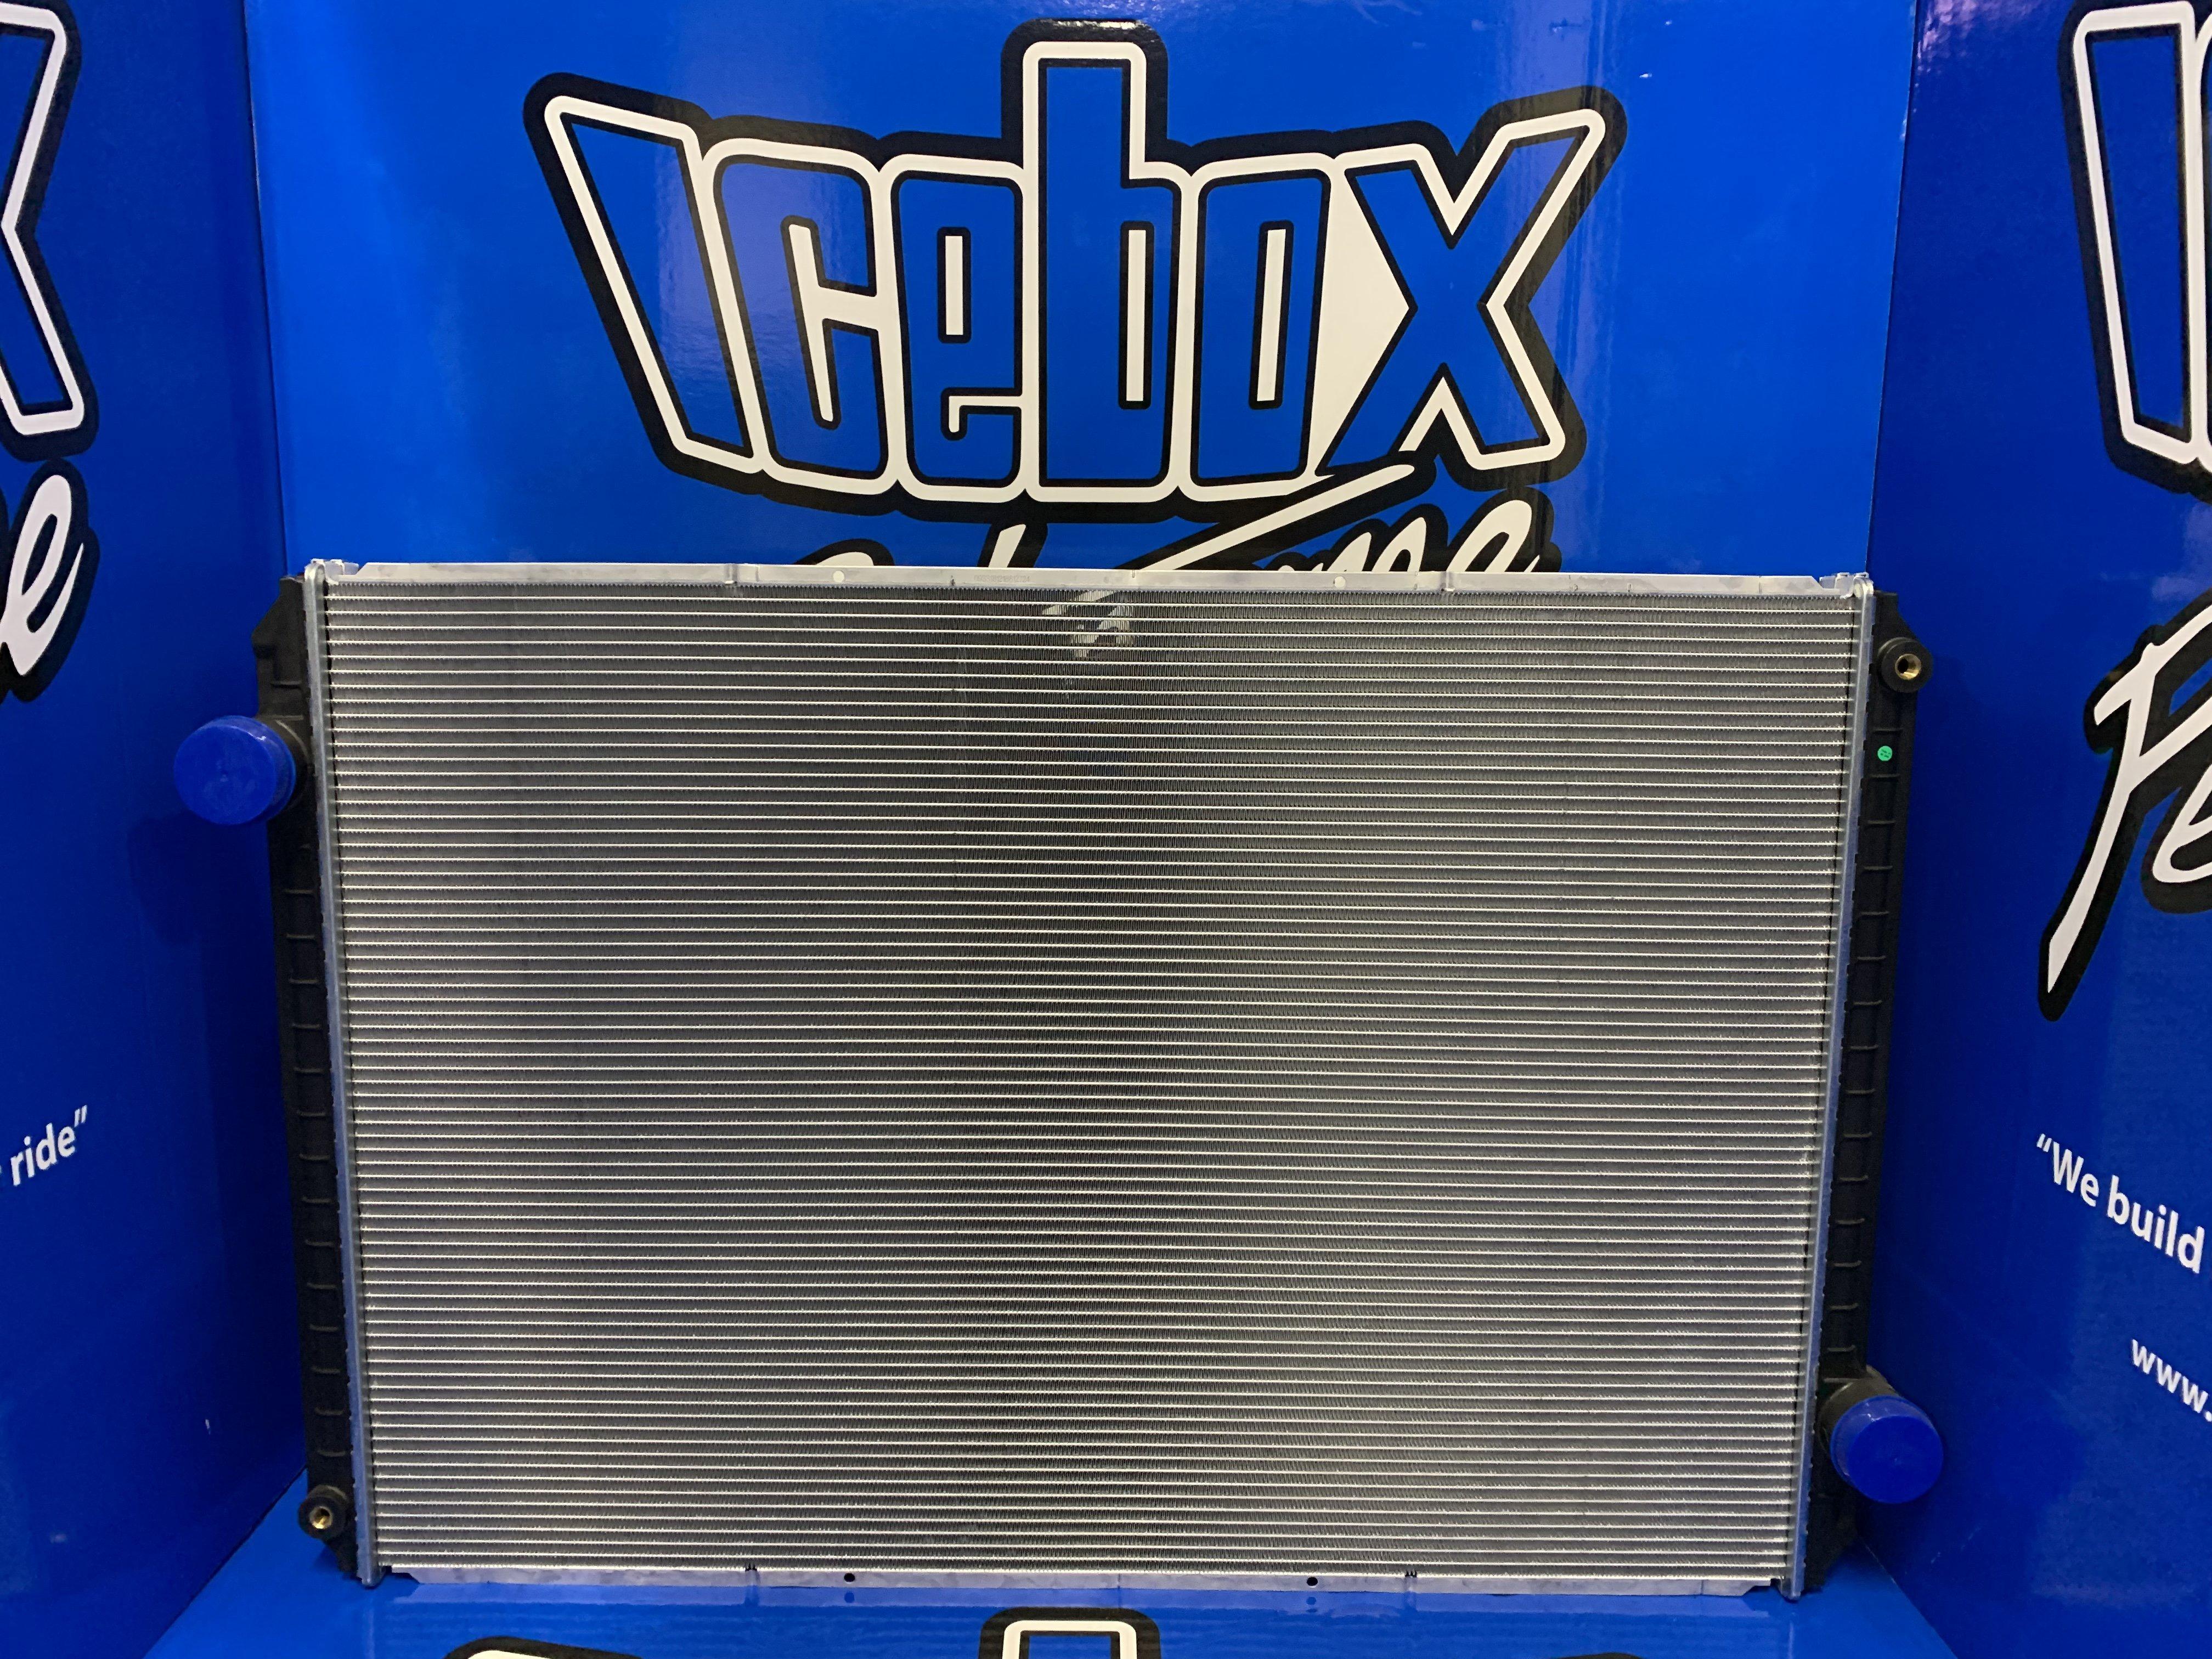 radiator-navistar-new-part-no-1616363c91-144595-15101677